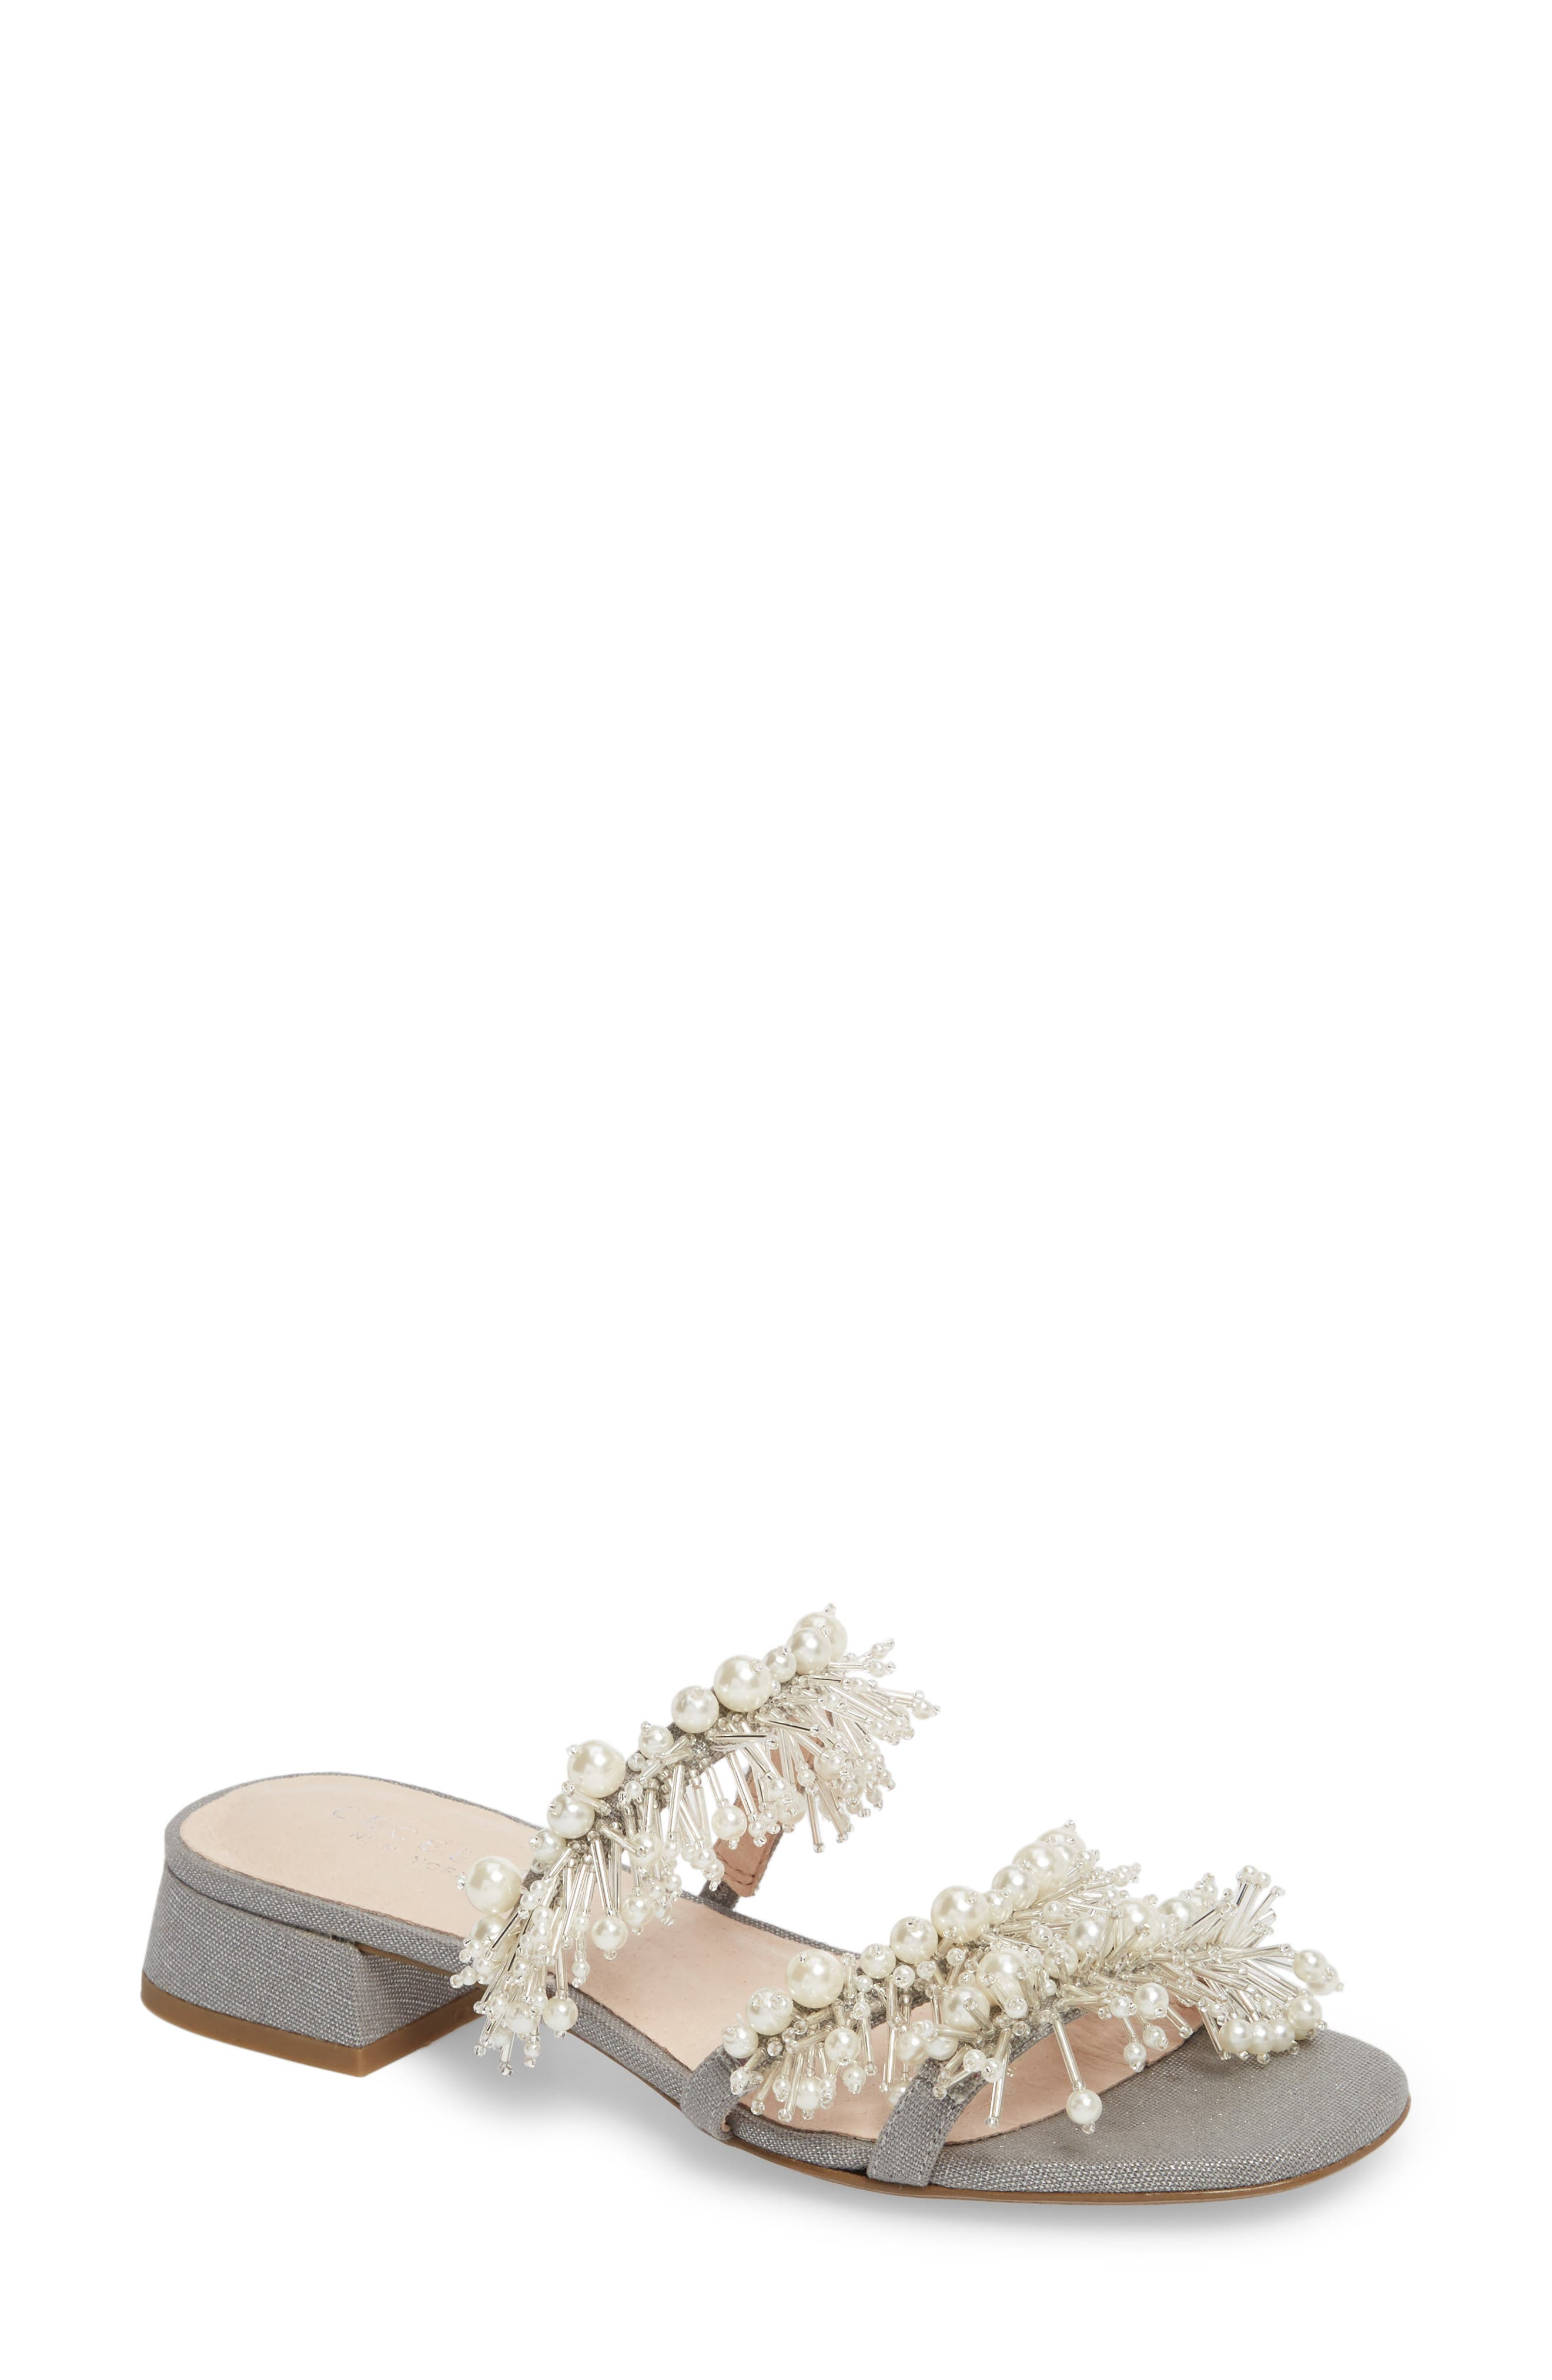 ,                             Fes Embellished Slide Sandal,                             Main thumbnail 1, color,                             GREY FABRIC